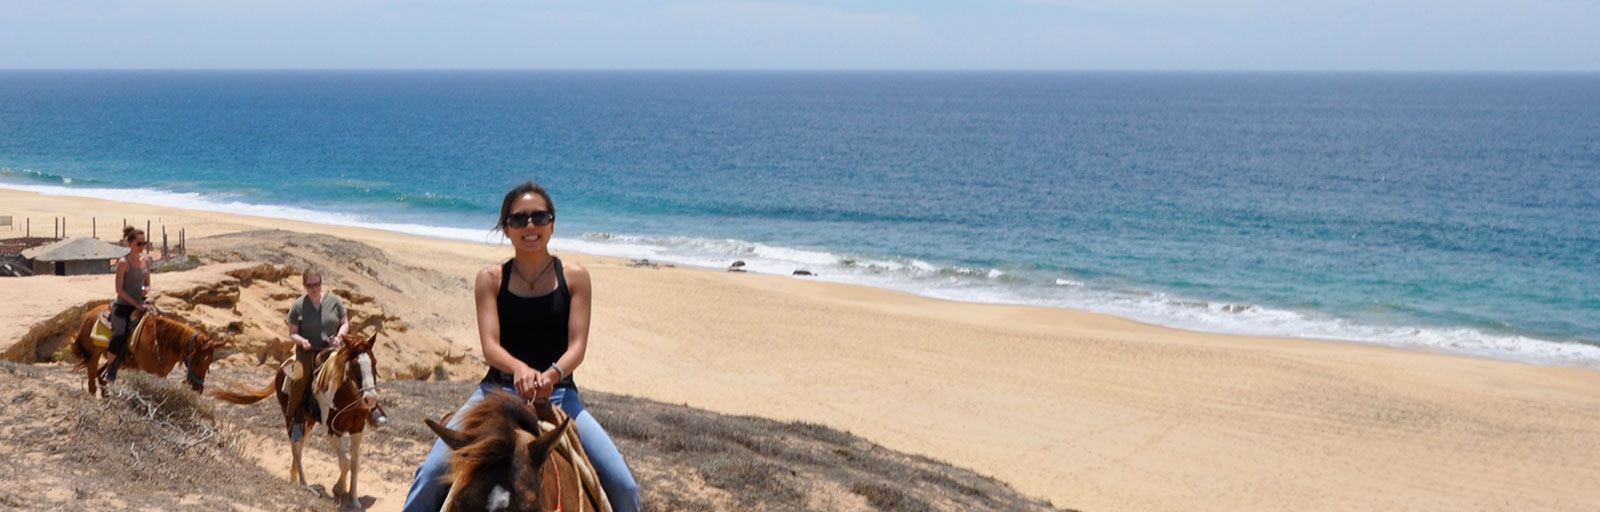 Horseback Riding & Yoga Retreat in Mexico: Ocean View